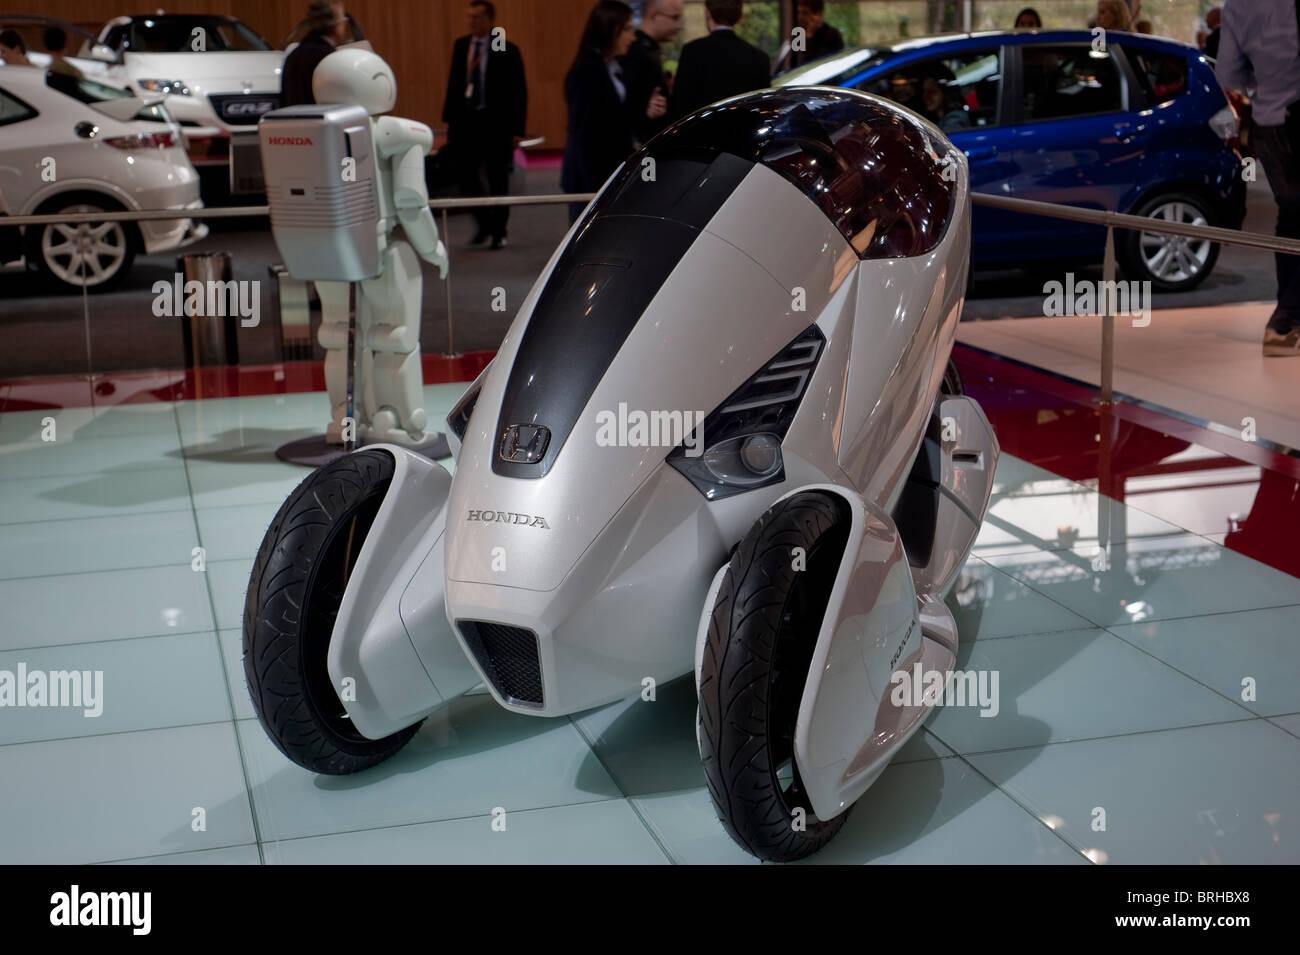 paris france paris car show electric motorcycle concept honda stock photo royalty free. Black Bedroom Furniture Sets. Home Design Ideas